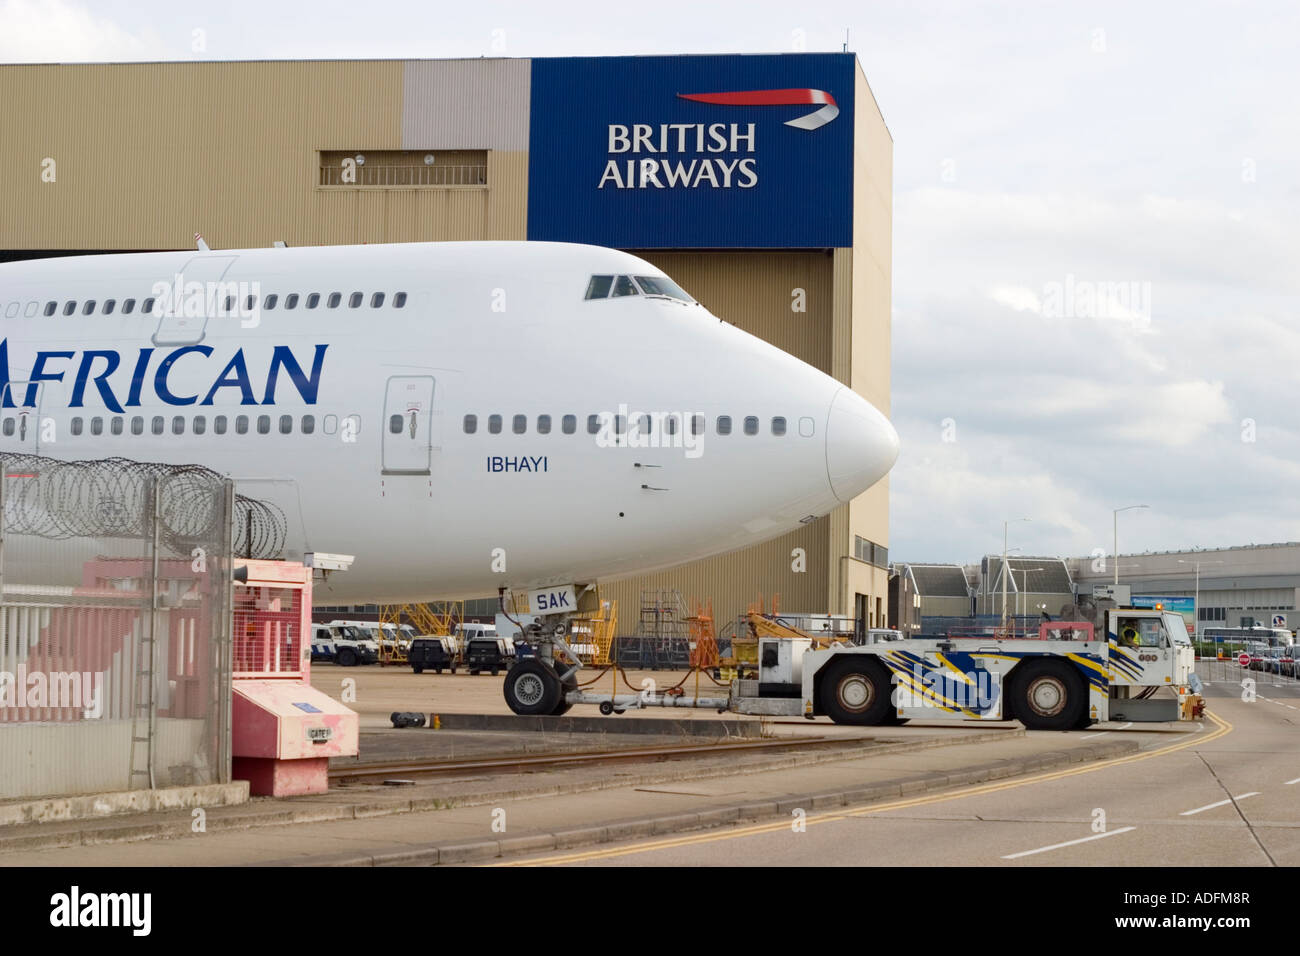 Boeing 747 444 South African Airways ZS SAK 005 Ibhayi crossing Eastchurch Road at London Heathrow Airport UK - Stock Image